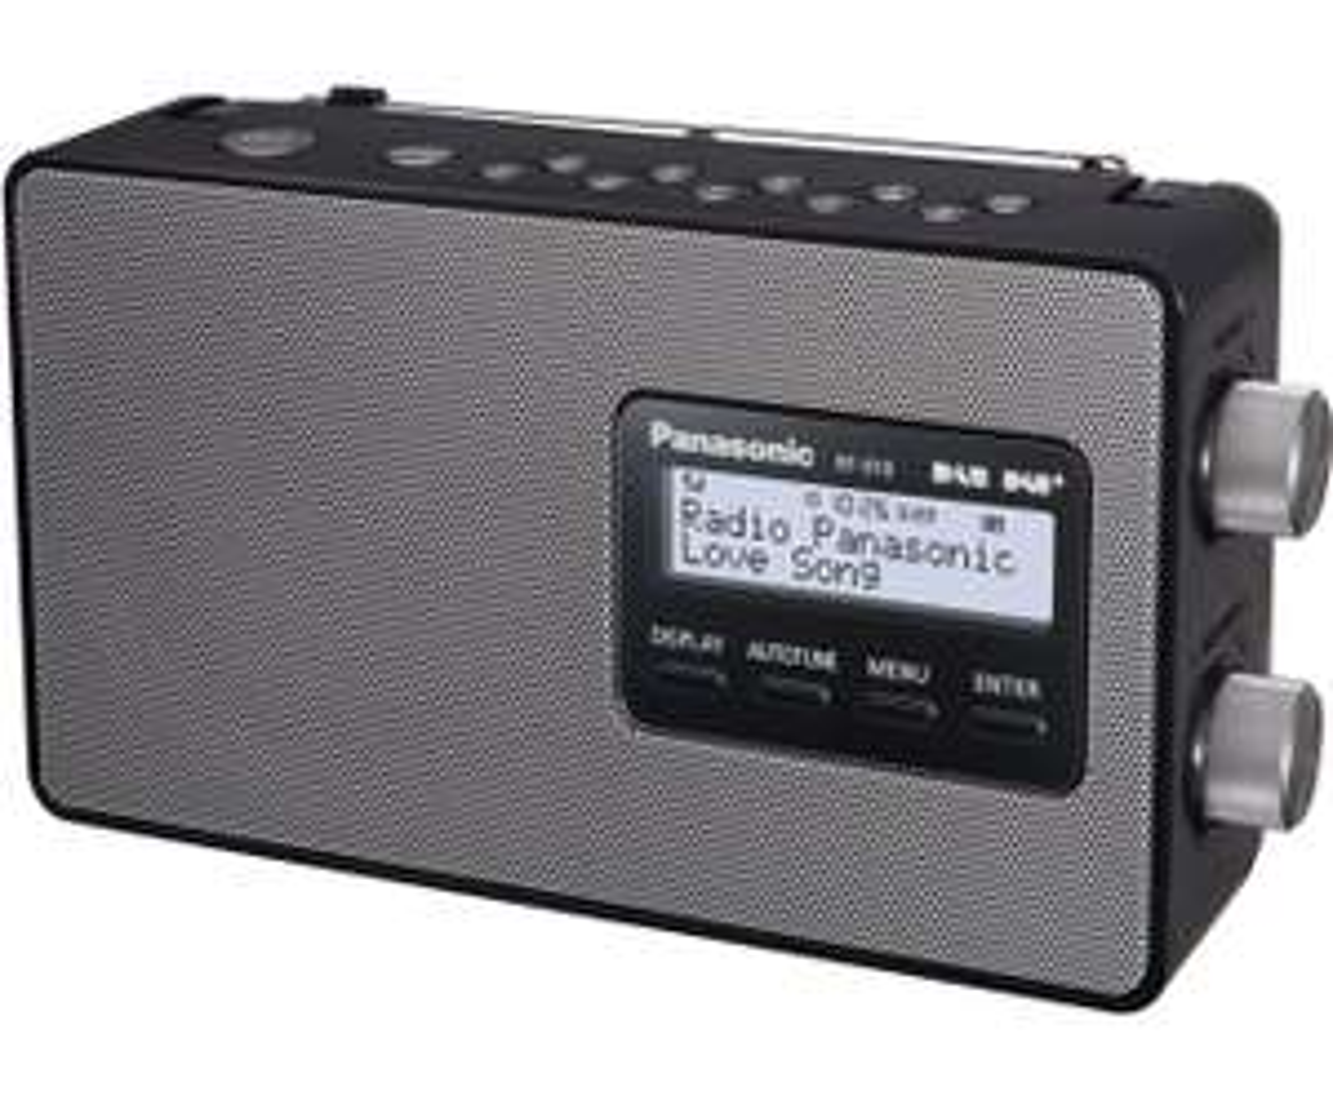 Panasonic RF-D10EG-K DAB+ radio voor €55 @ AO.nl